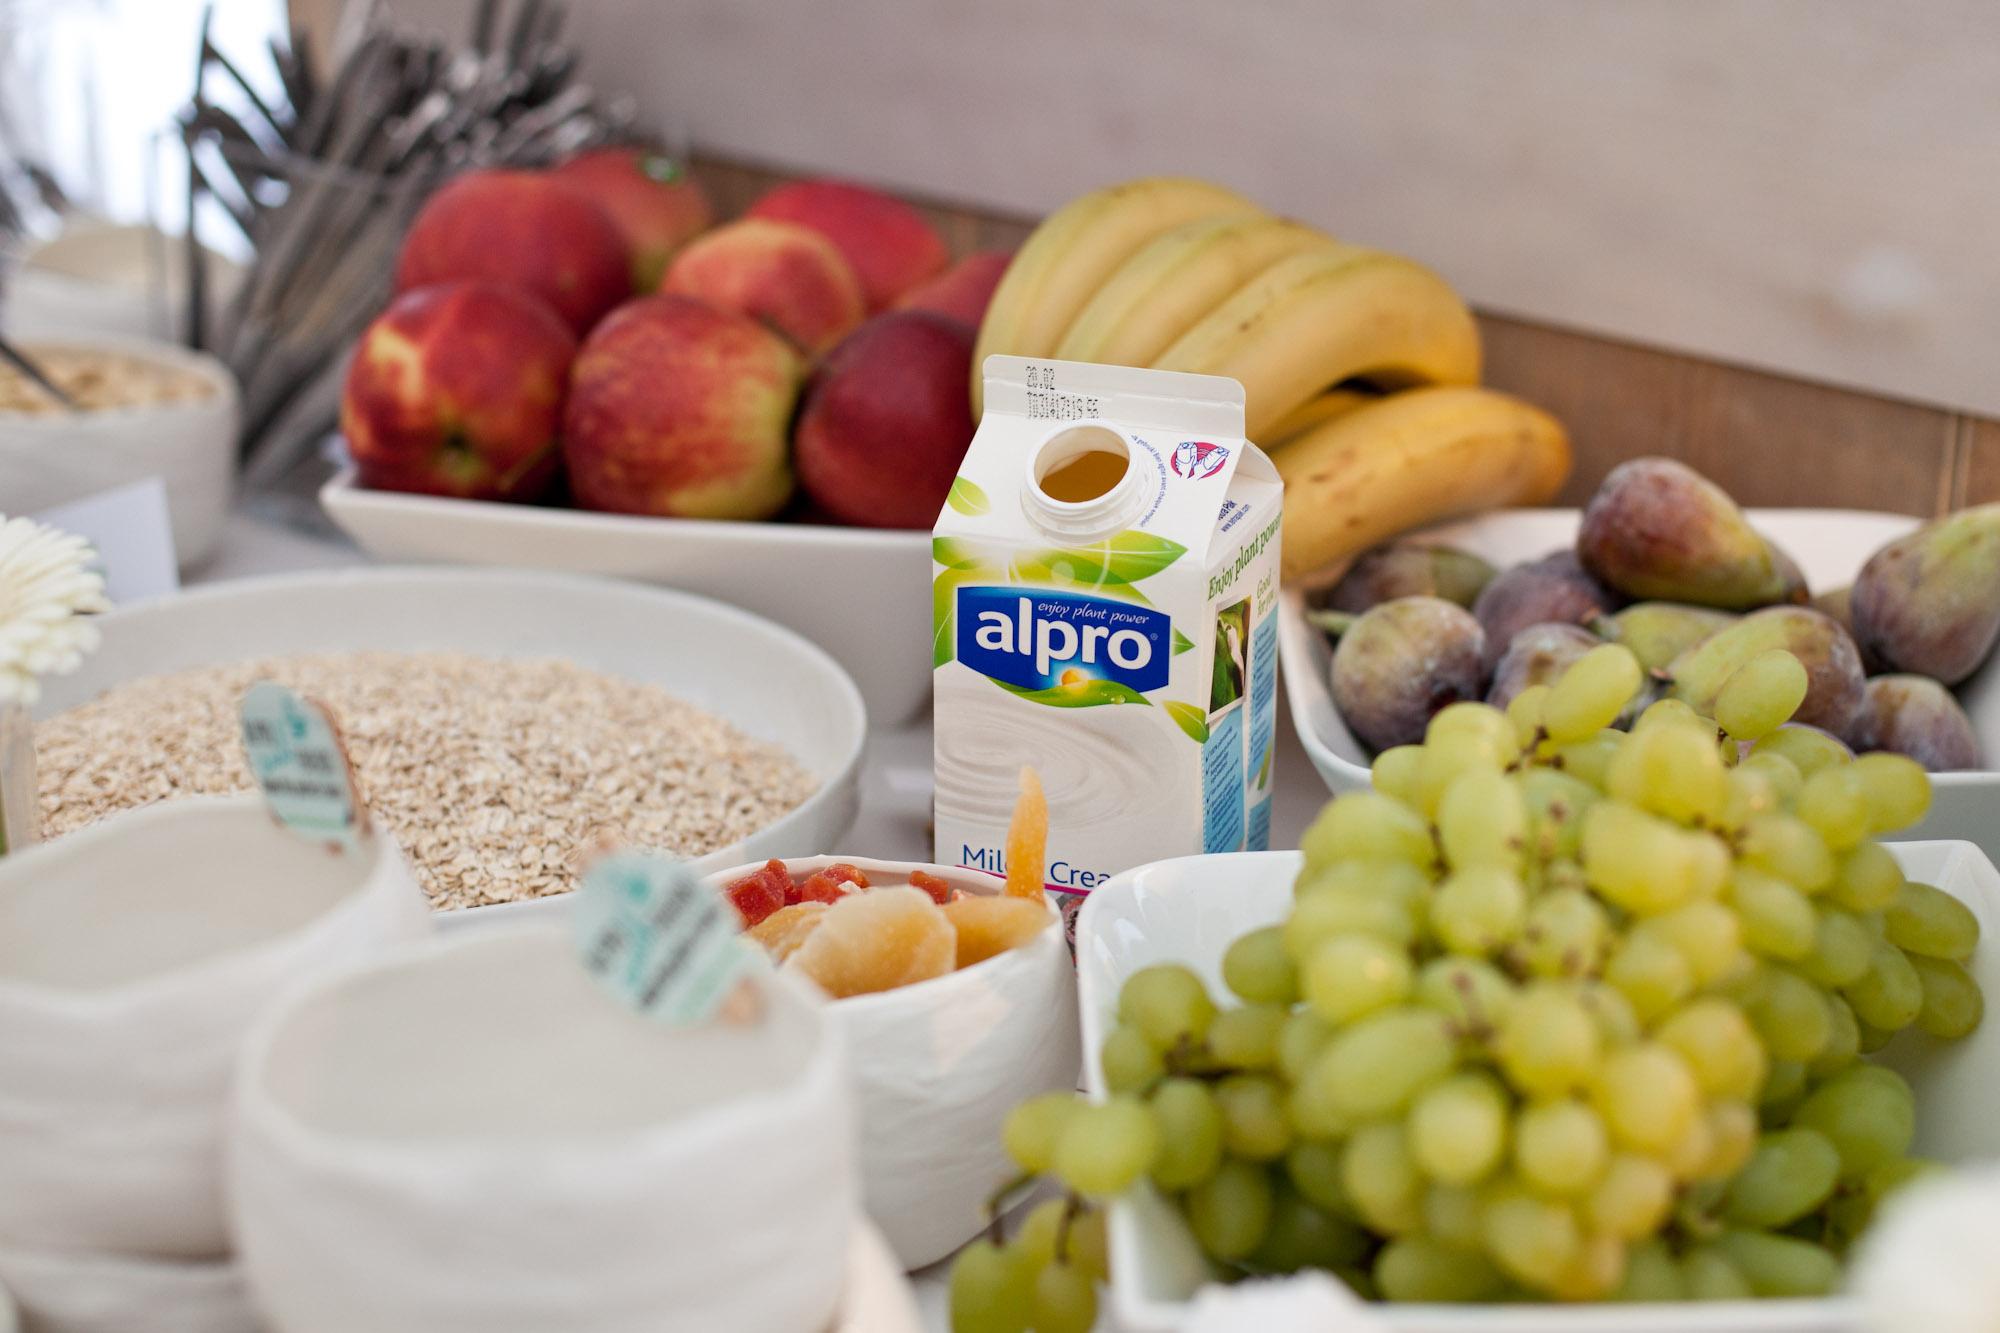 alpro mild mornings